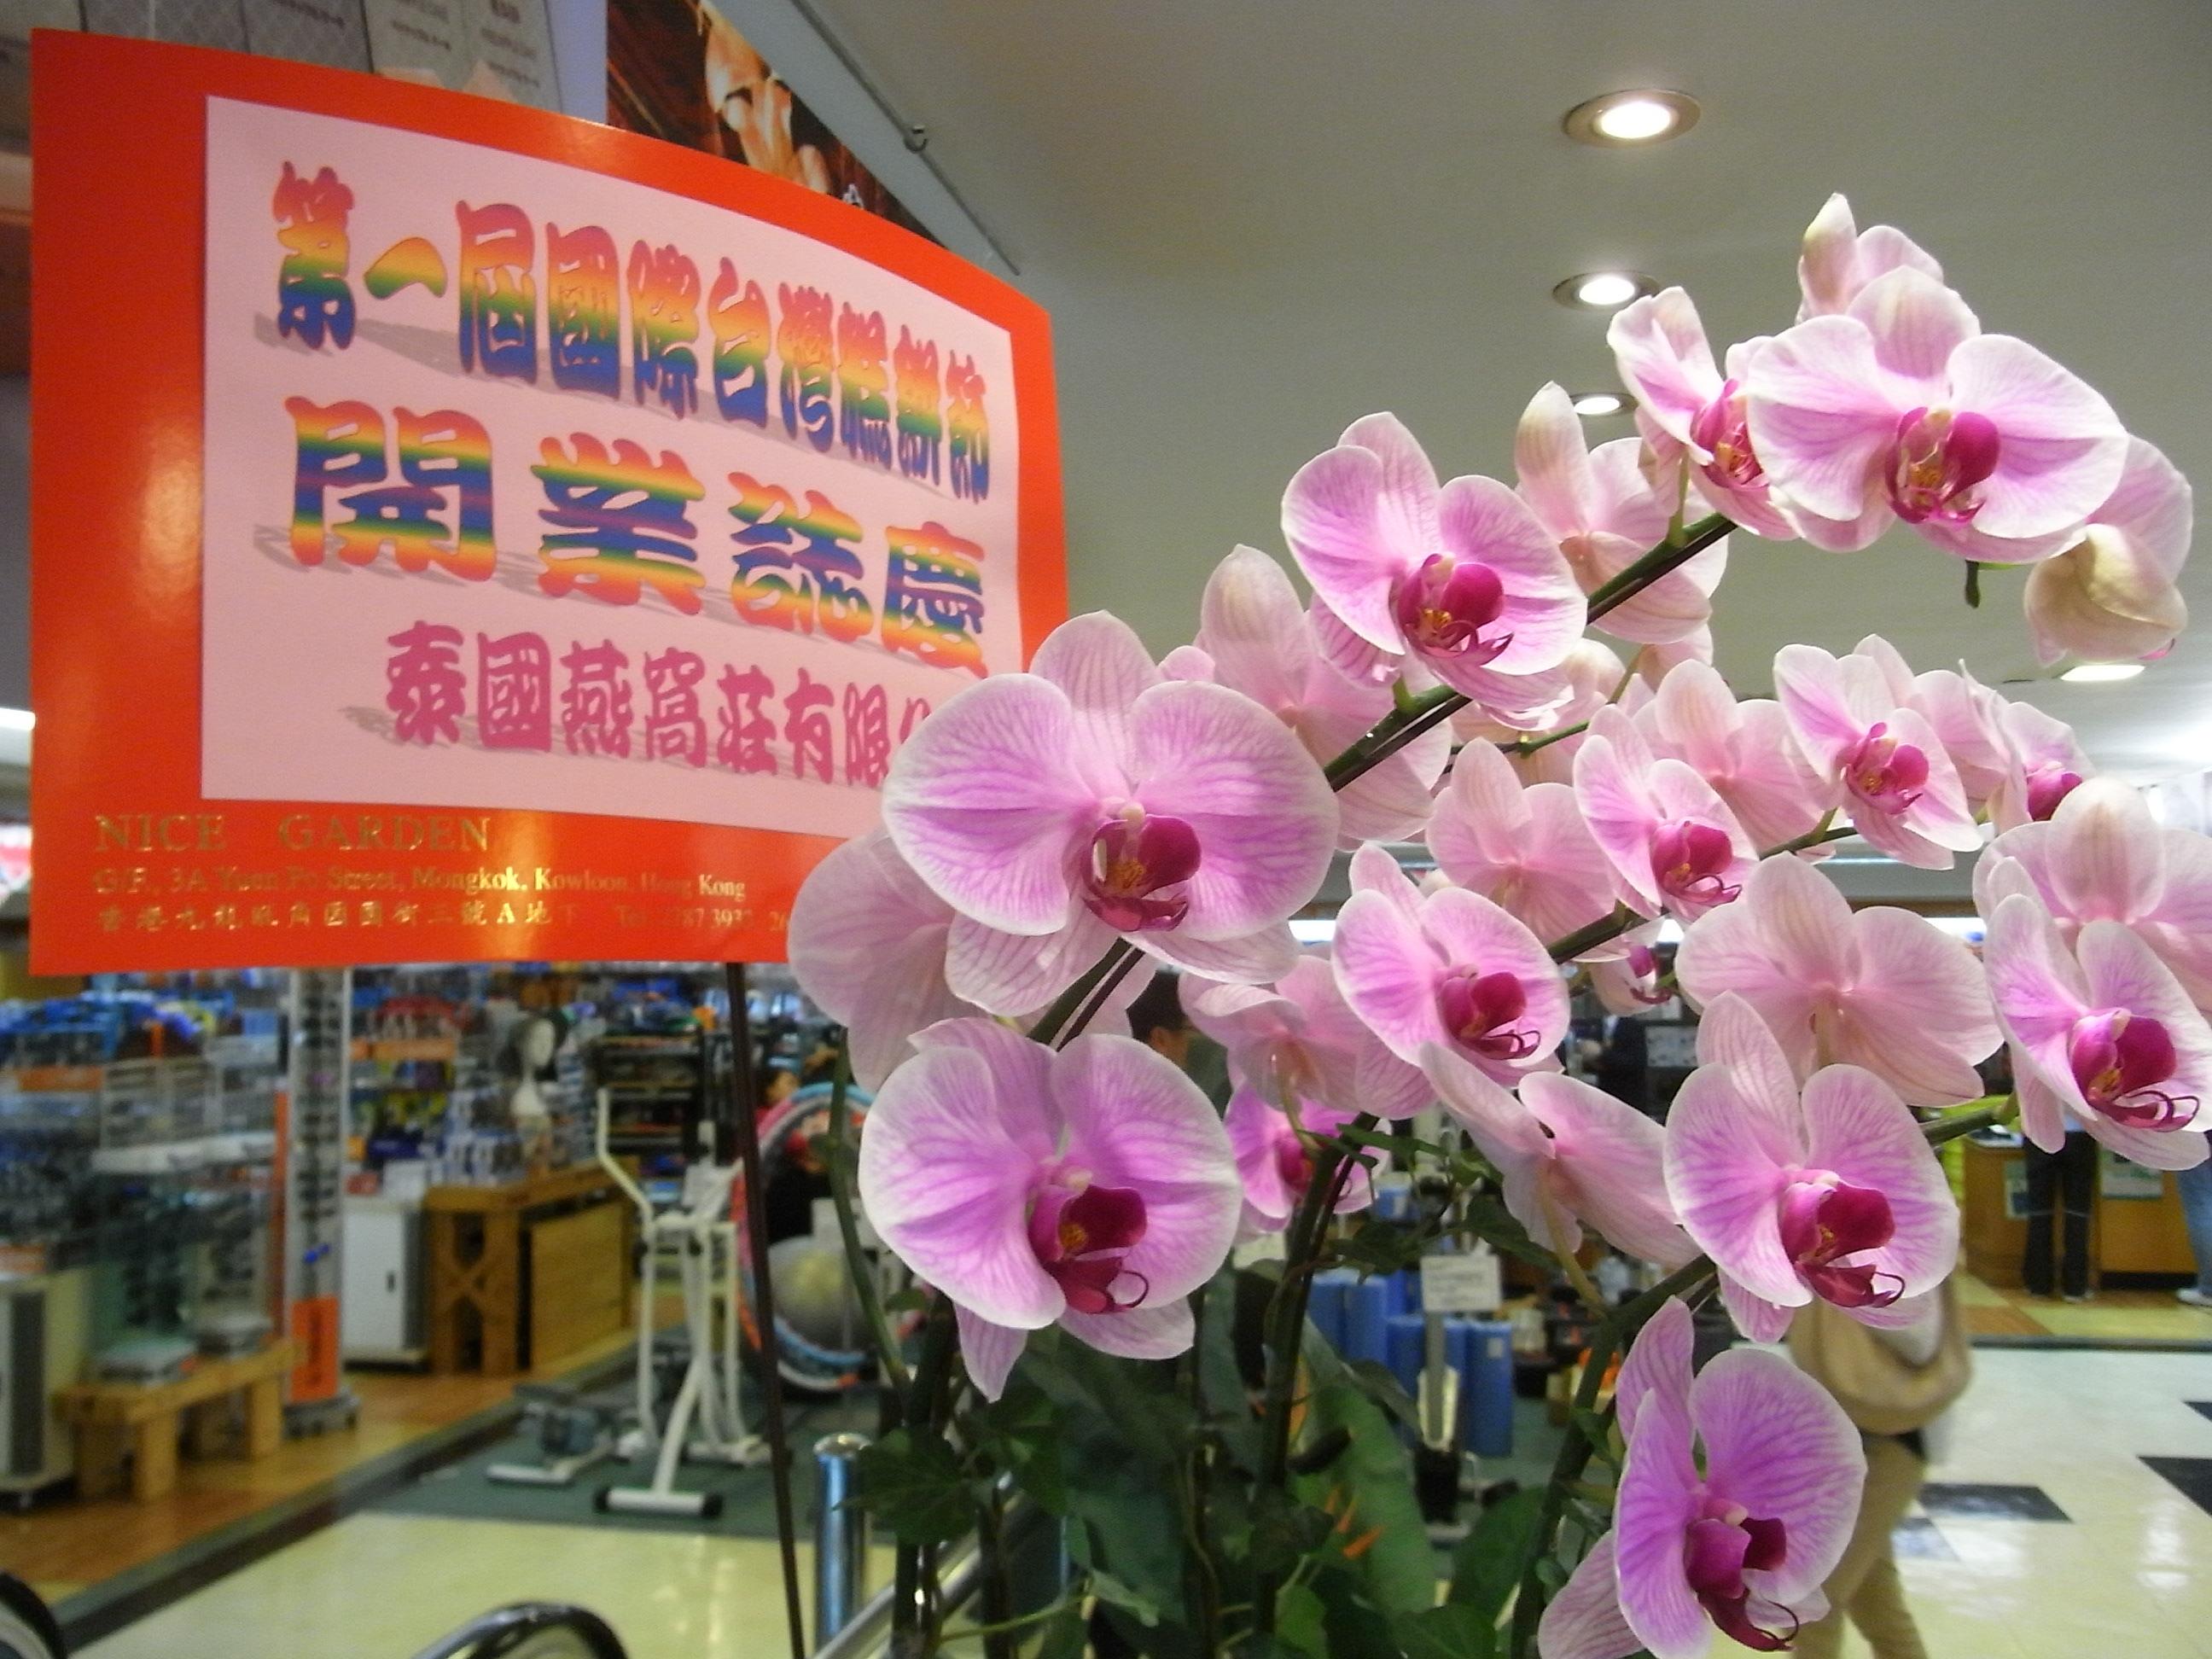 Filehk jordan yhcpe yue hwa chinese products emporium 1st pastry filehk jordan yhcpe yue hwa chinese products emporium 1st pastry fectival taiwan pink flowers mightylinksfo